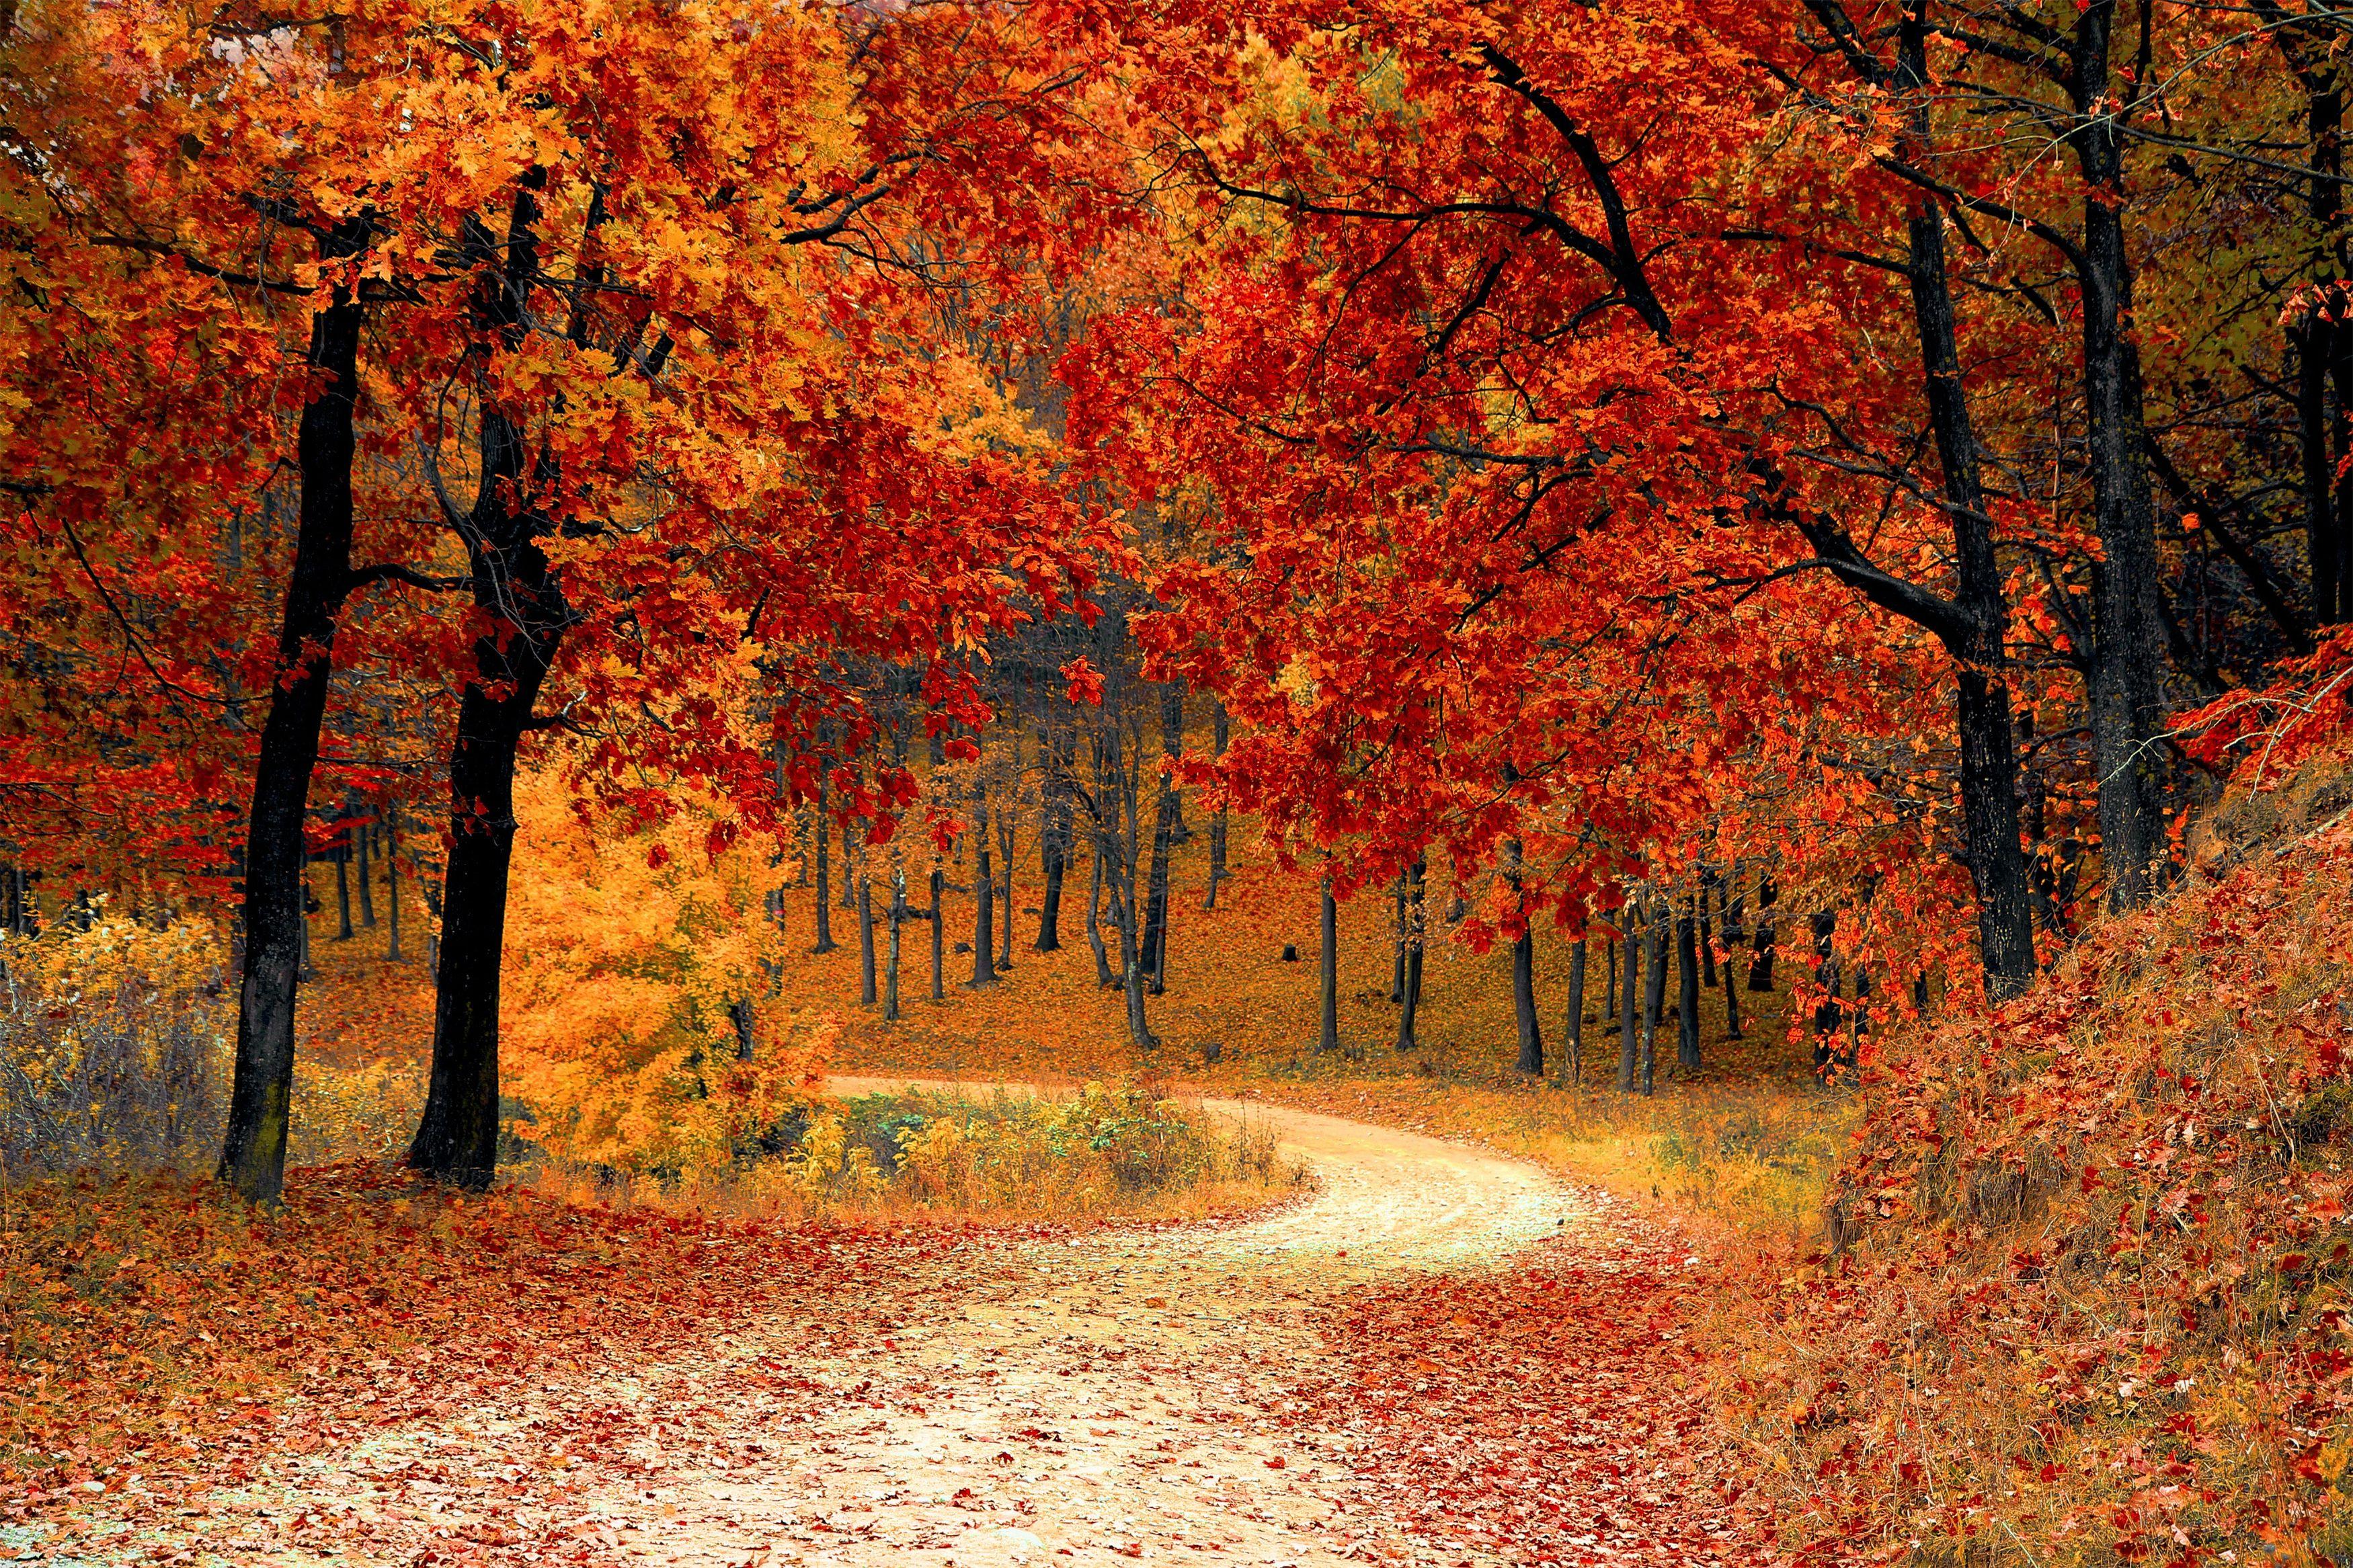 обои осенняя дорожка, осень, лес, дорога картинки фото